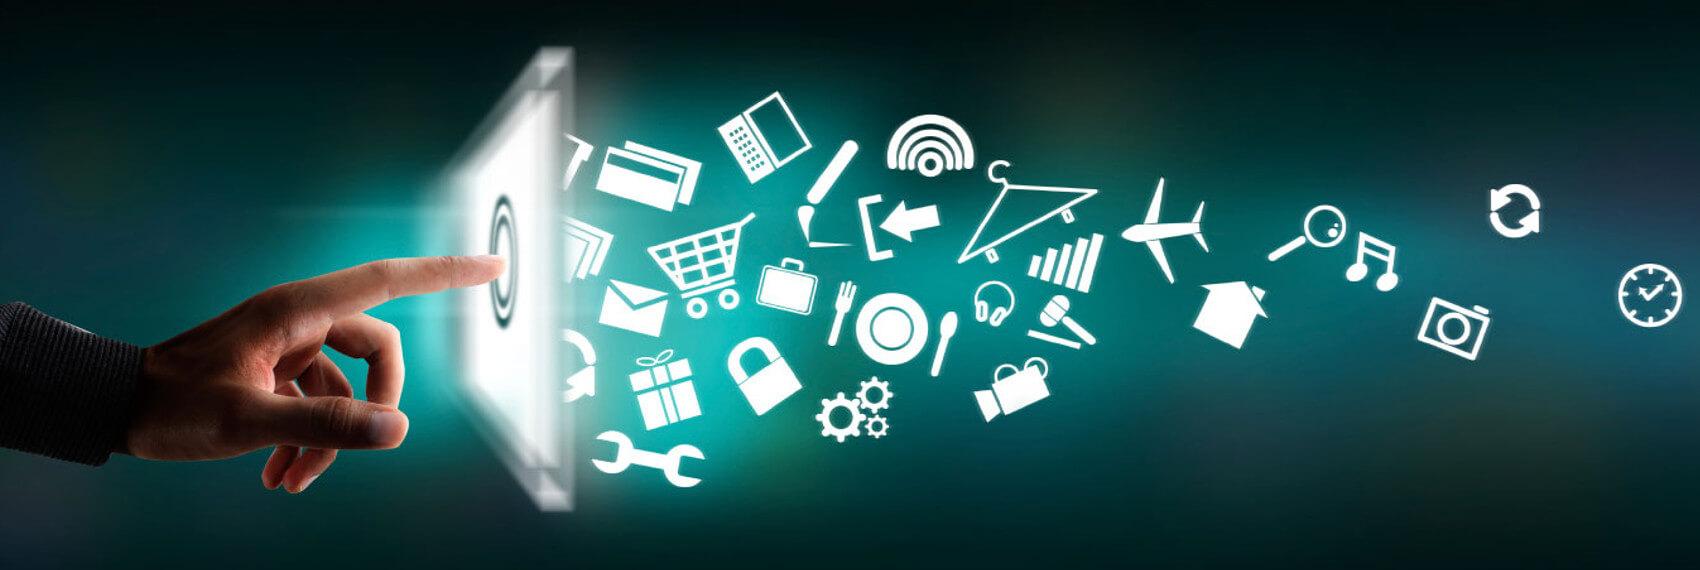 Mopinion: Humanising marketing - with Data Management Platforms - future